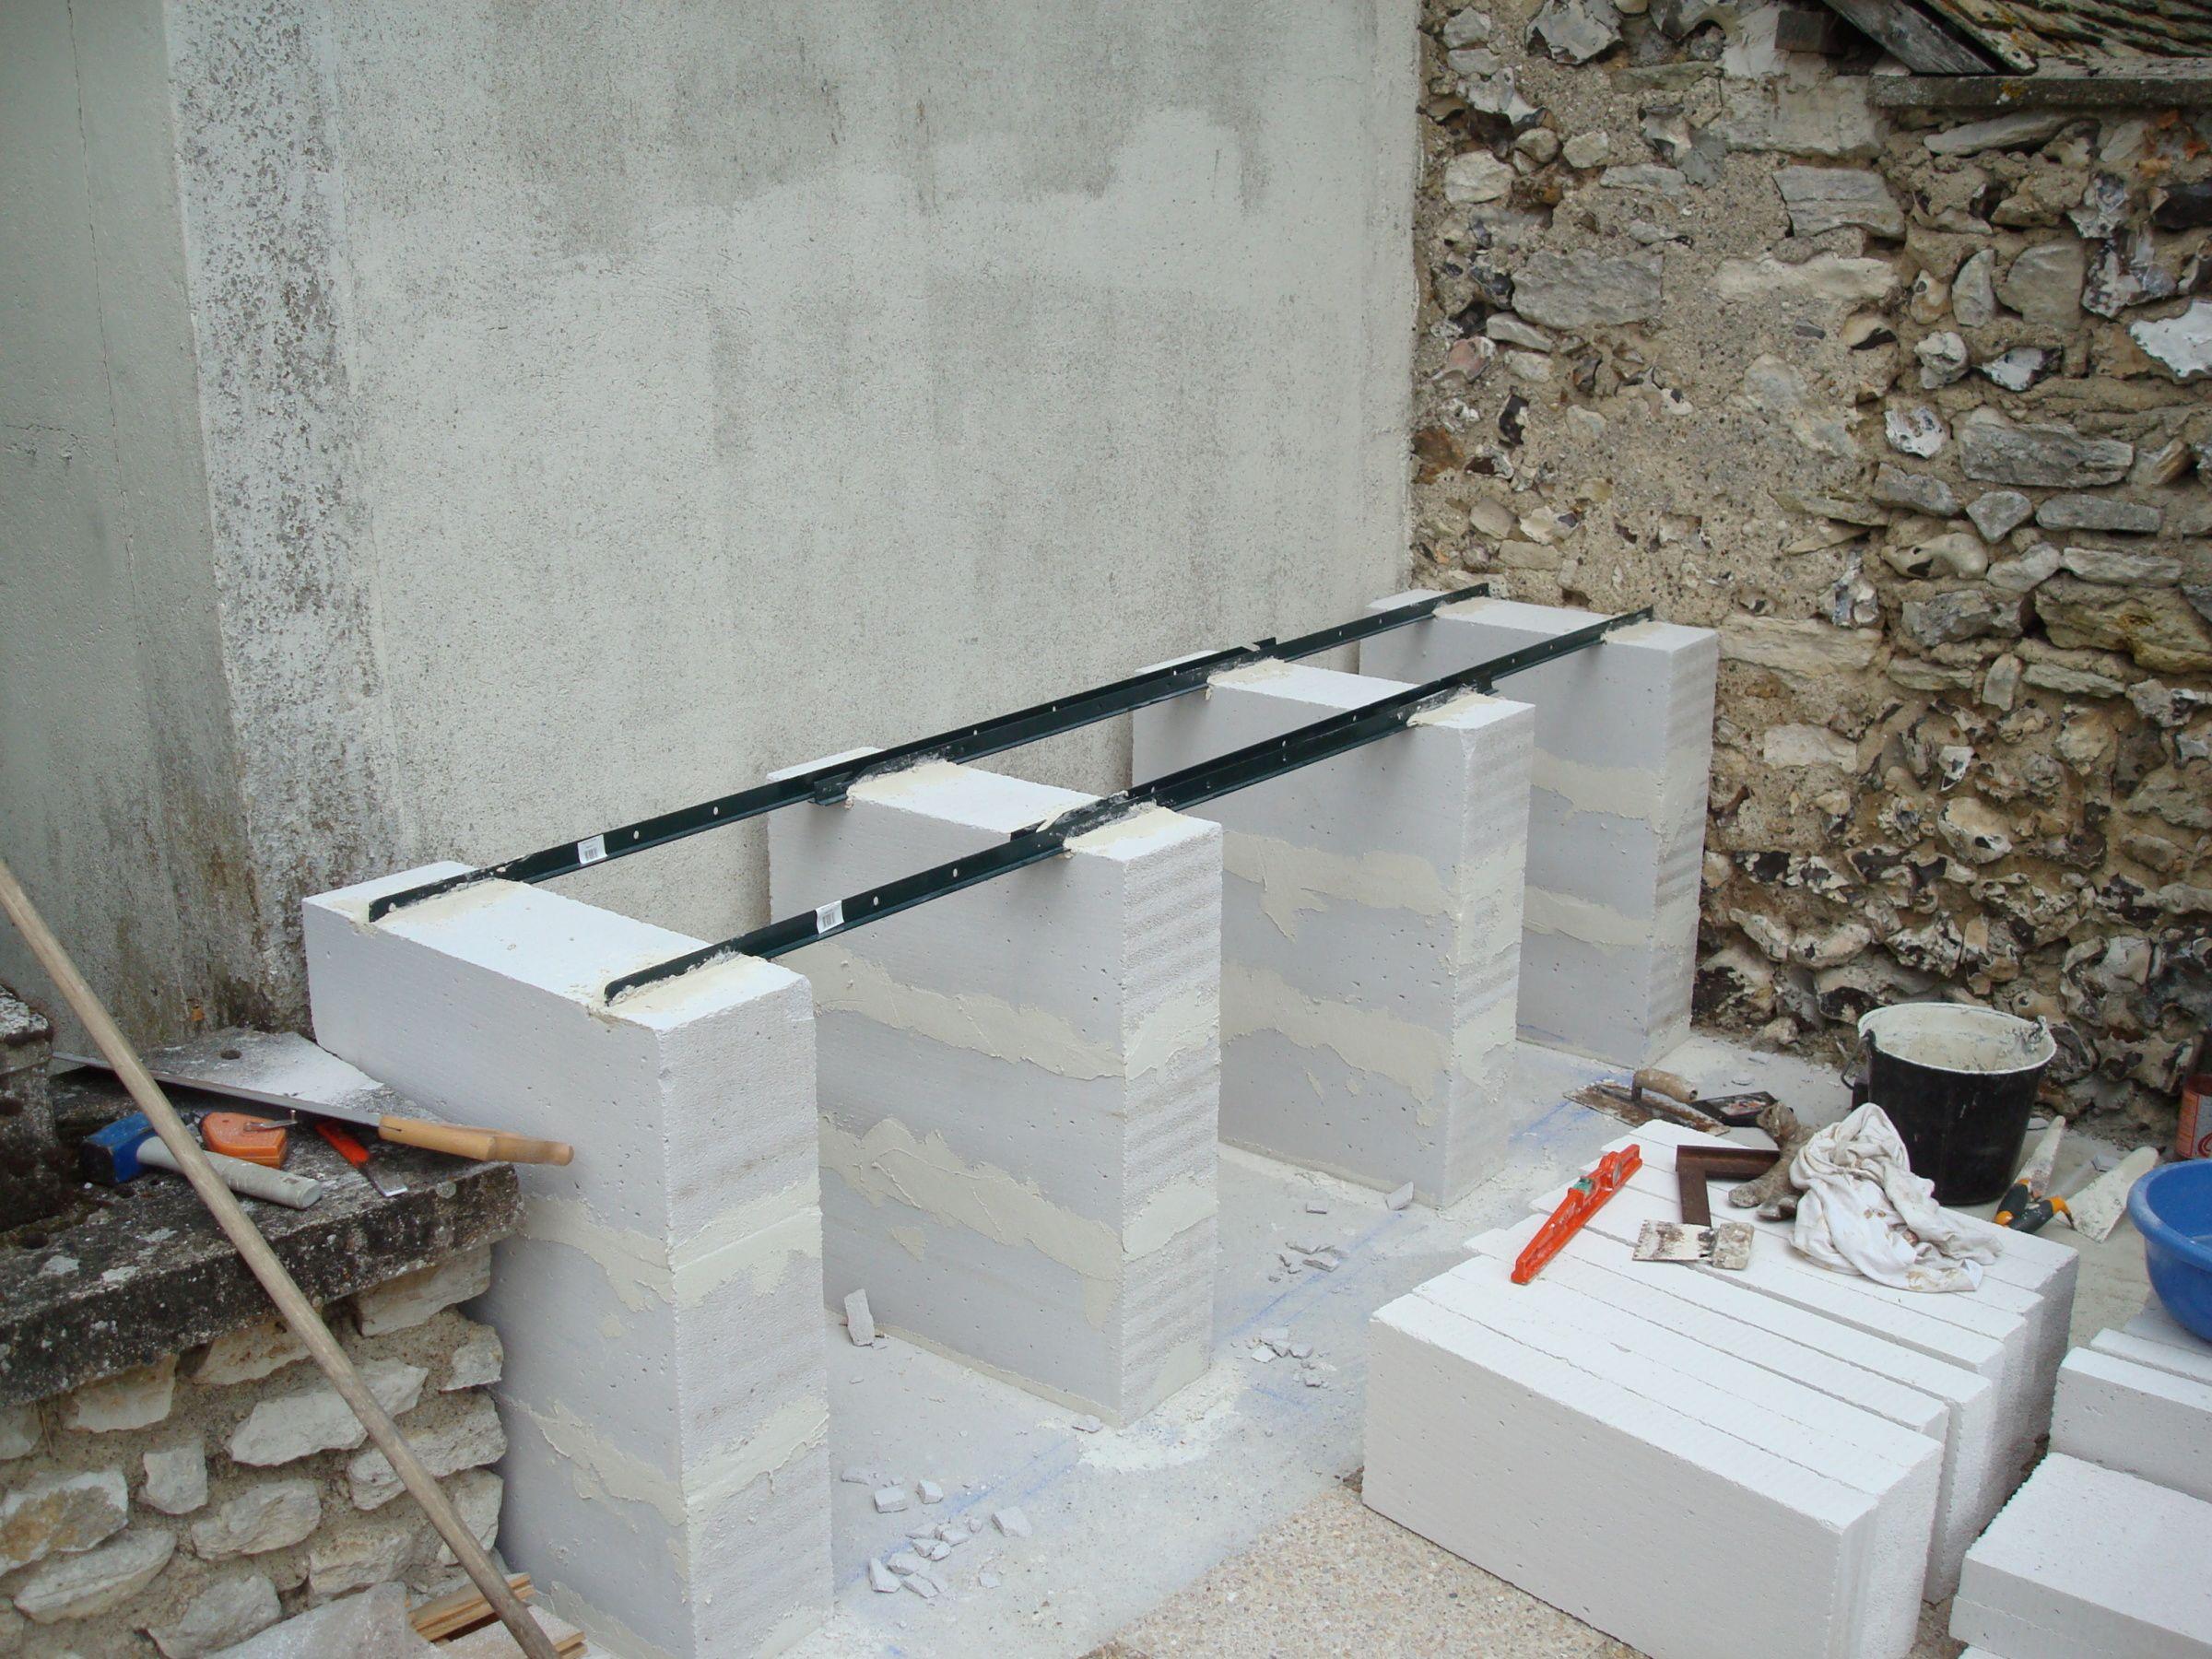 Construction D Un Barbecue Sur Mesure Construire Un Barbecue Barbecue En Beton Et Barbecue